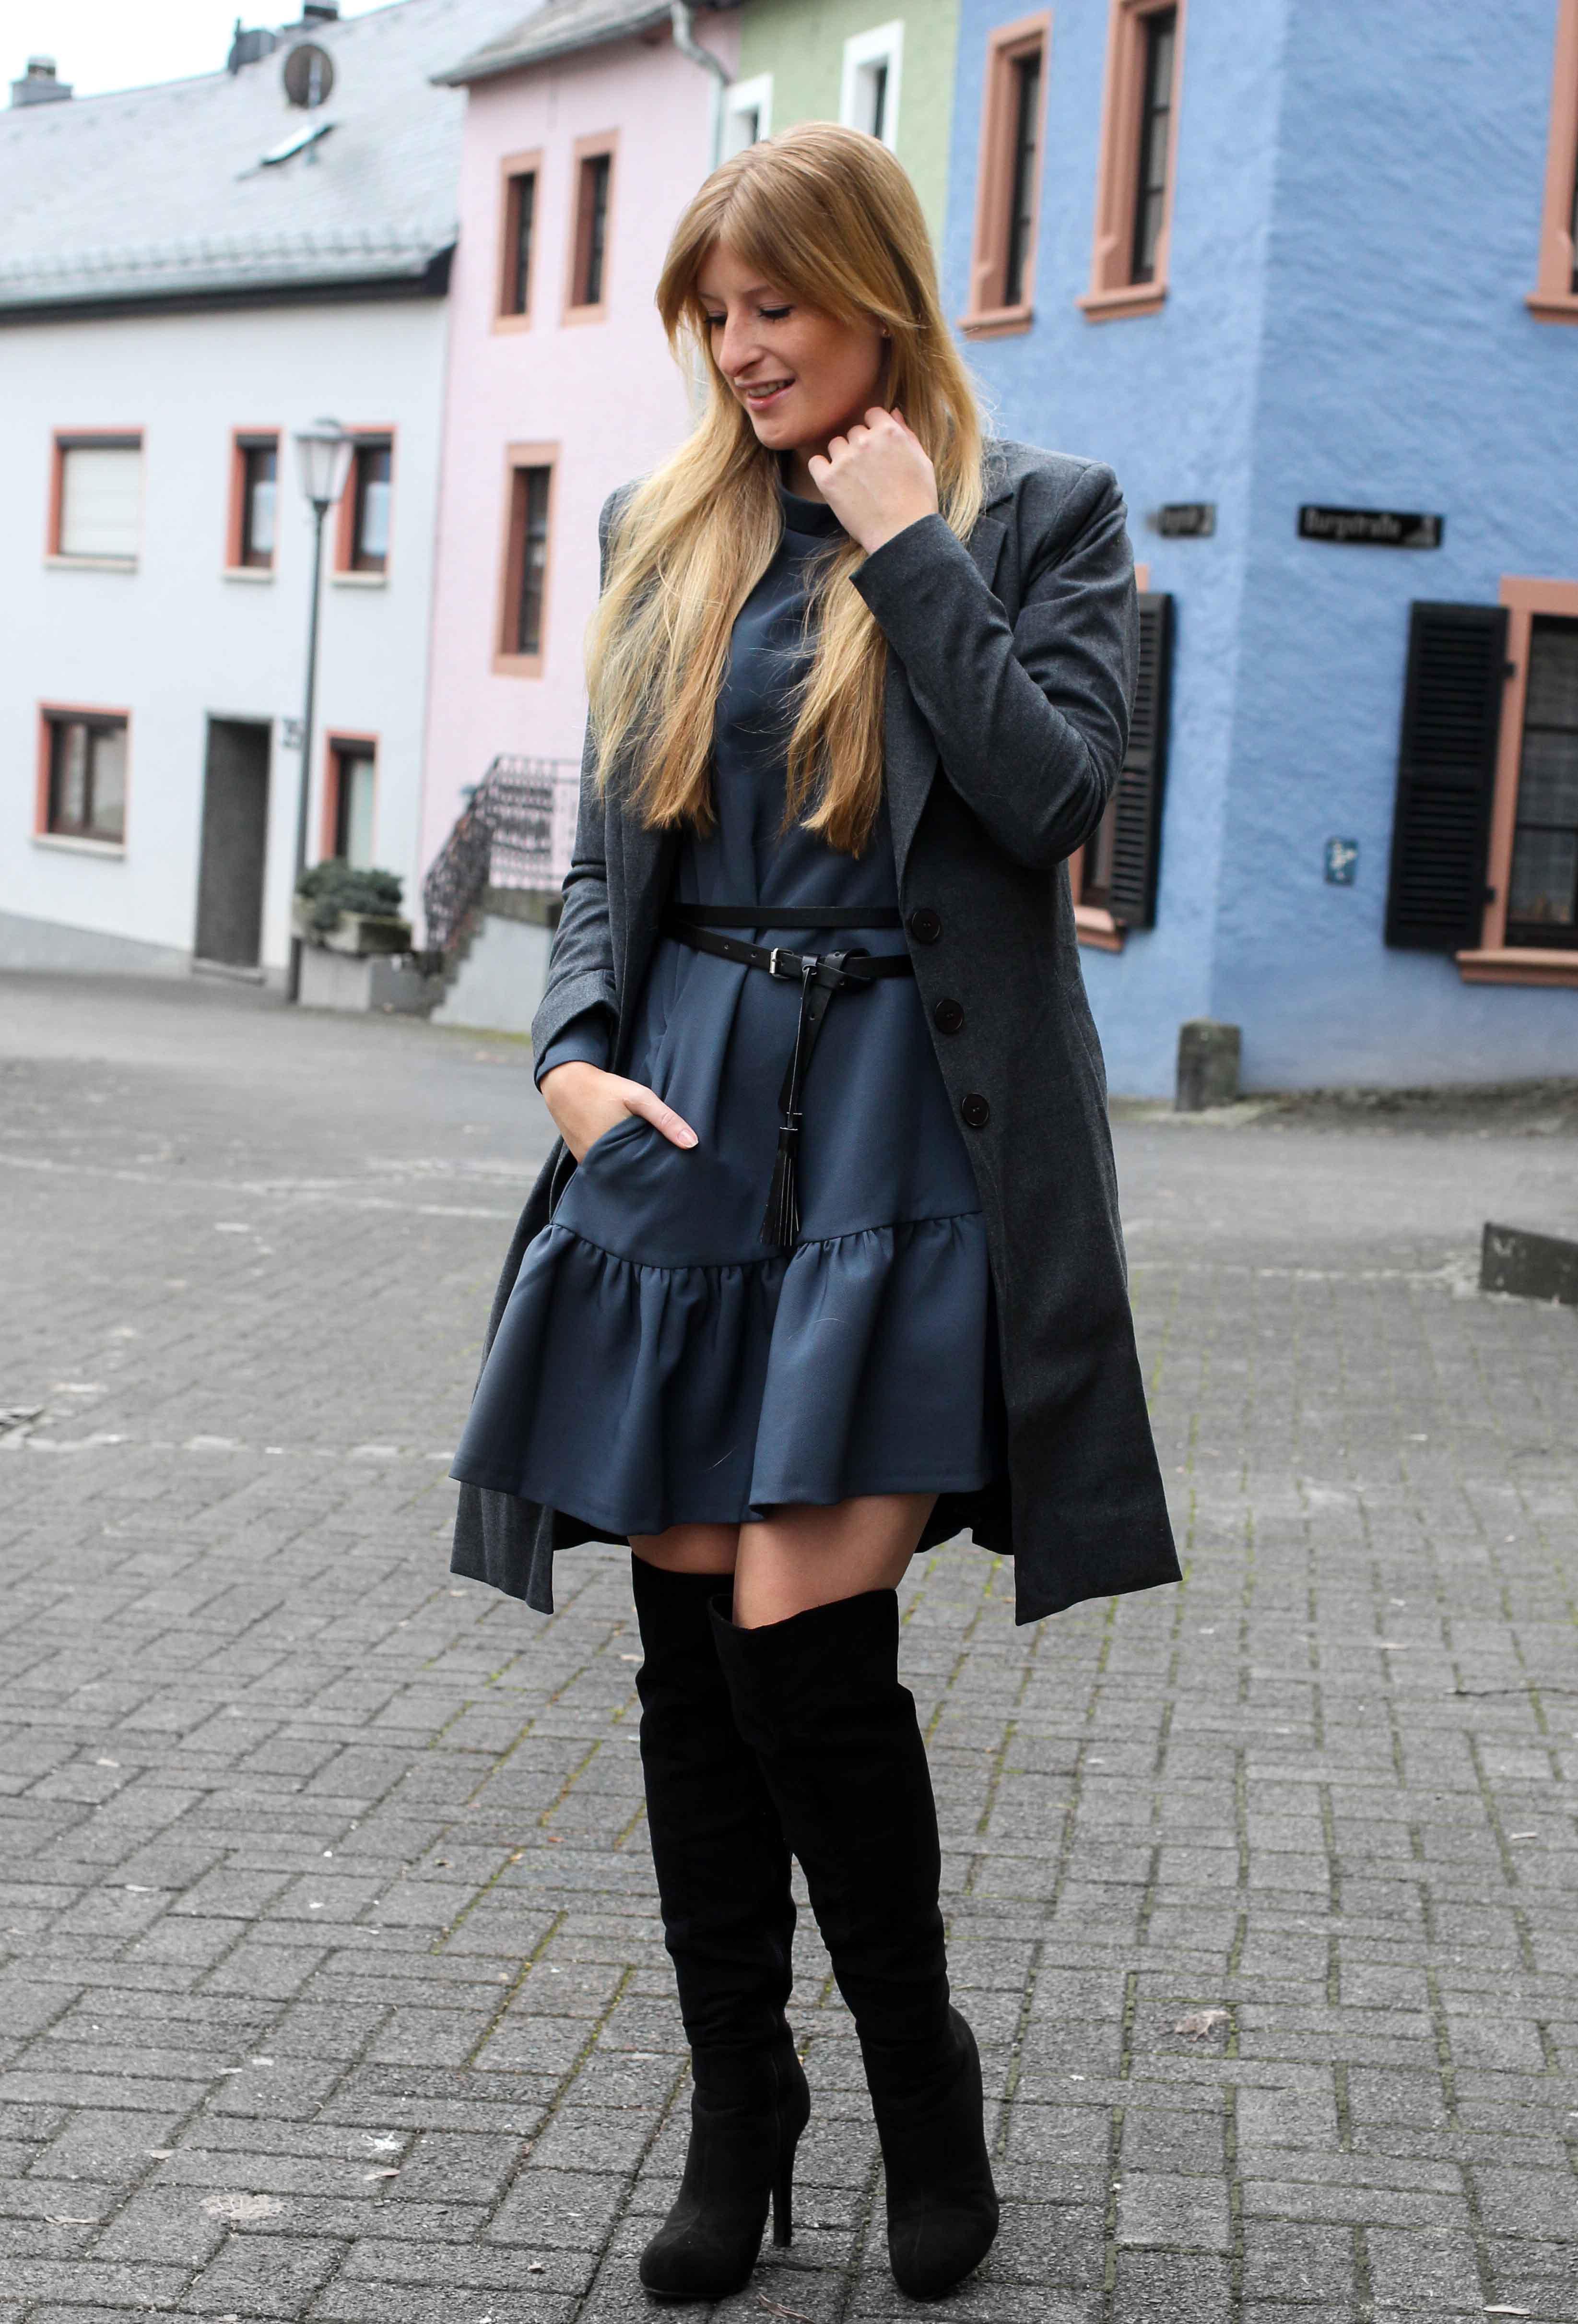 Blaues Winterkleid Closet London schwarze Overknees grauer Mantel Winter Outfit Modeblog 1